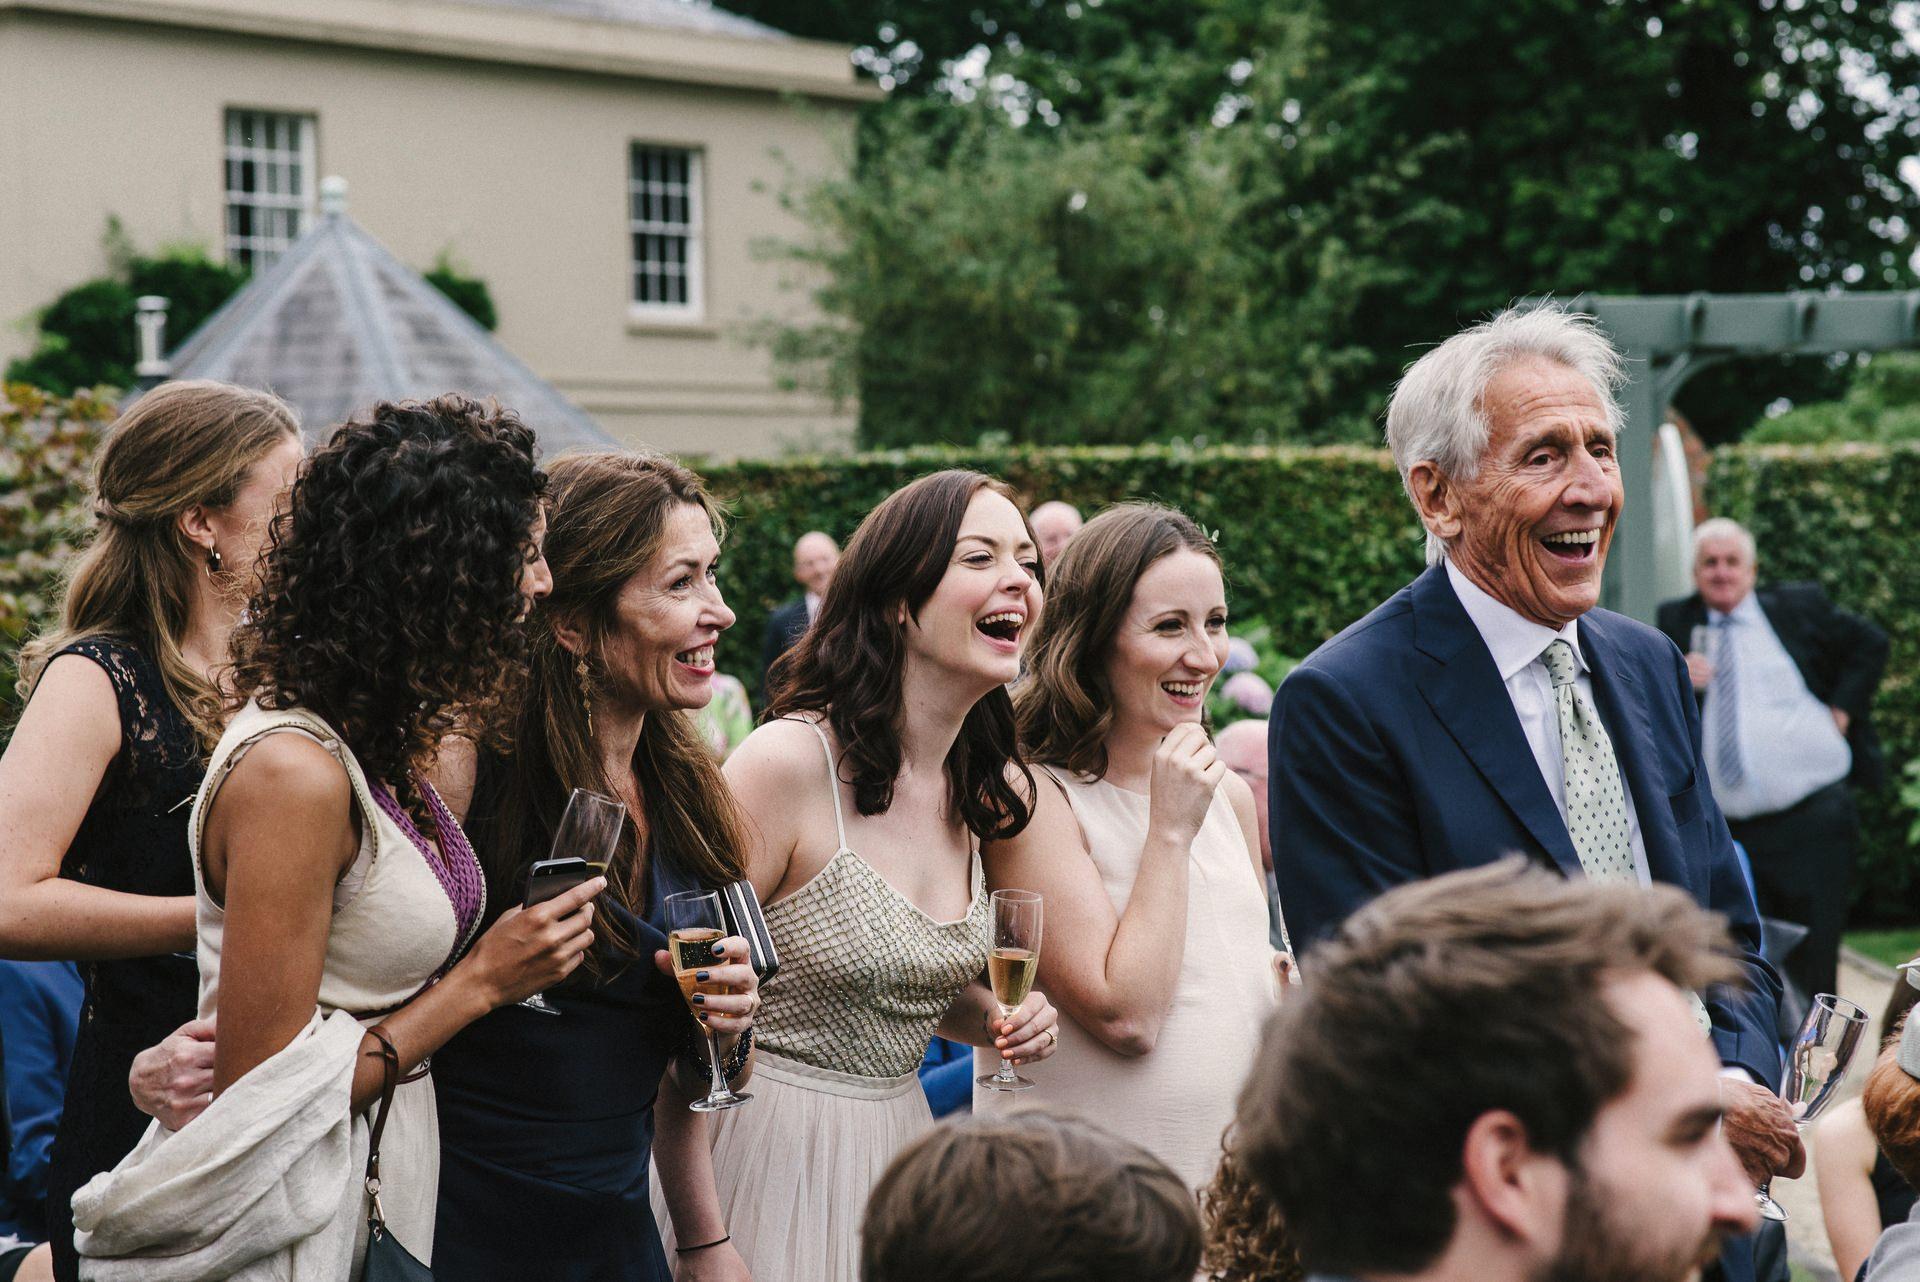 wedding at tullyveery house074.JPG